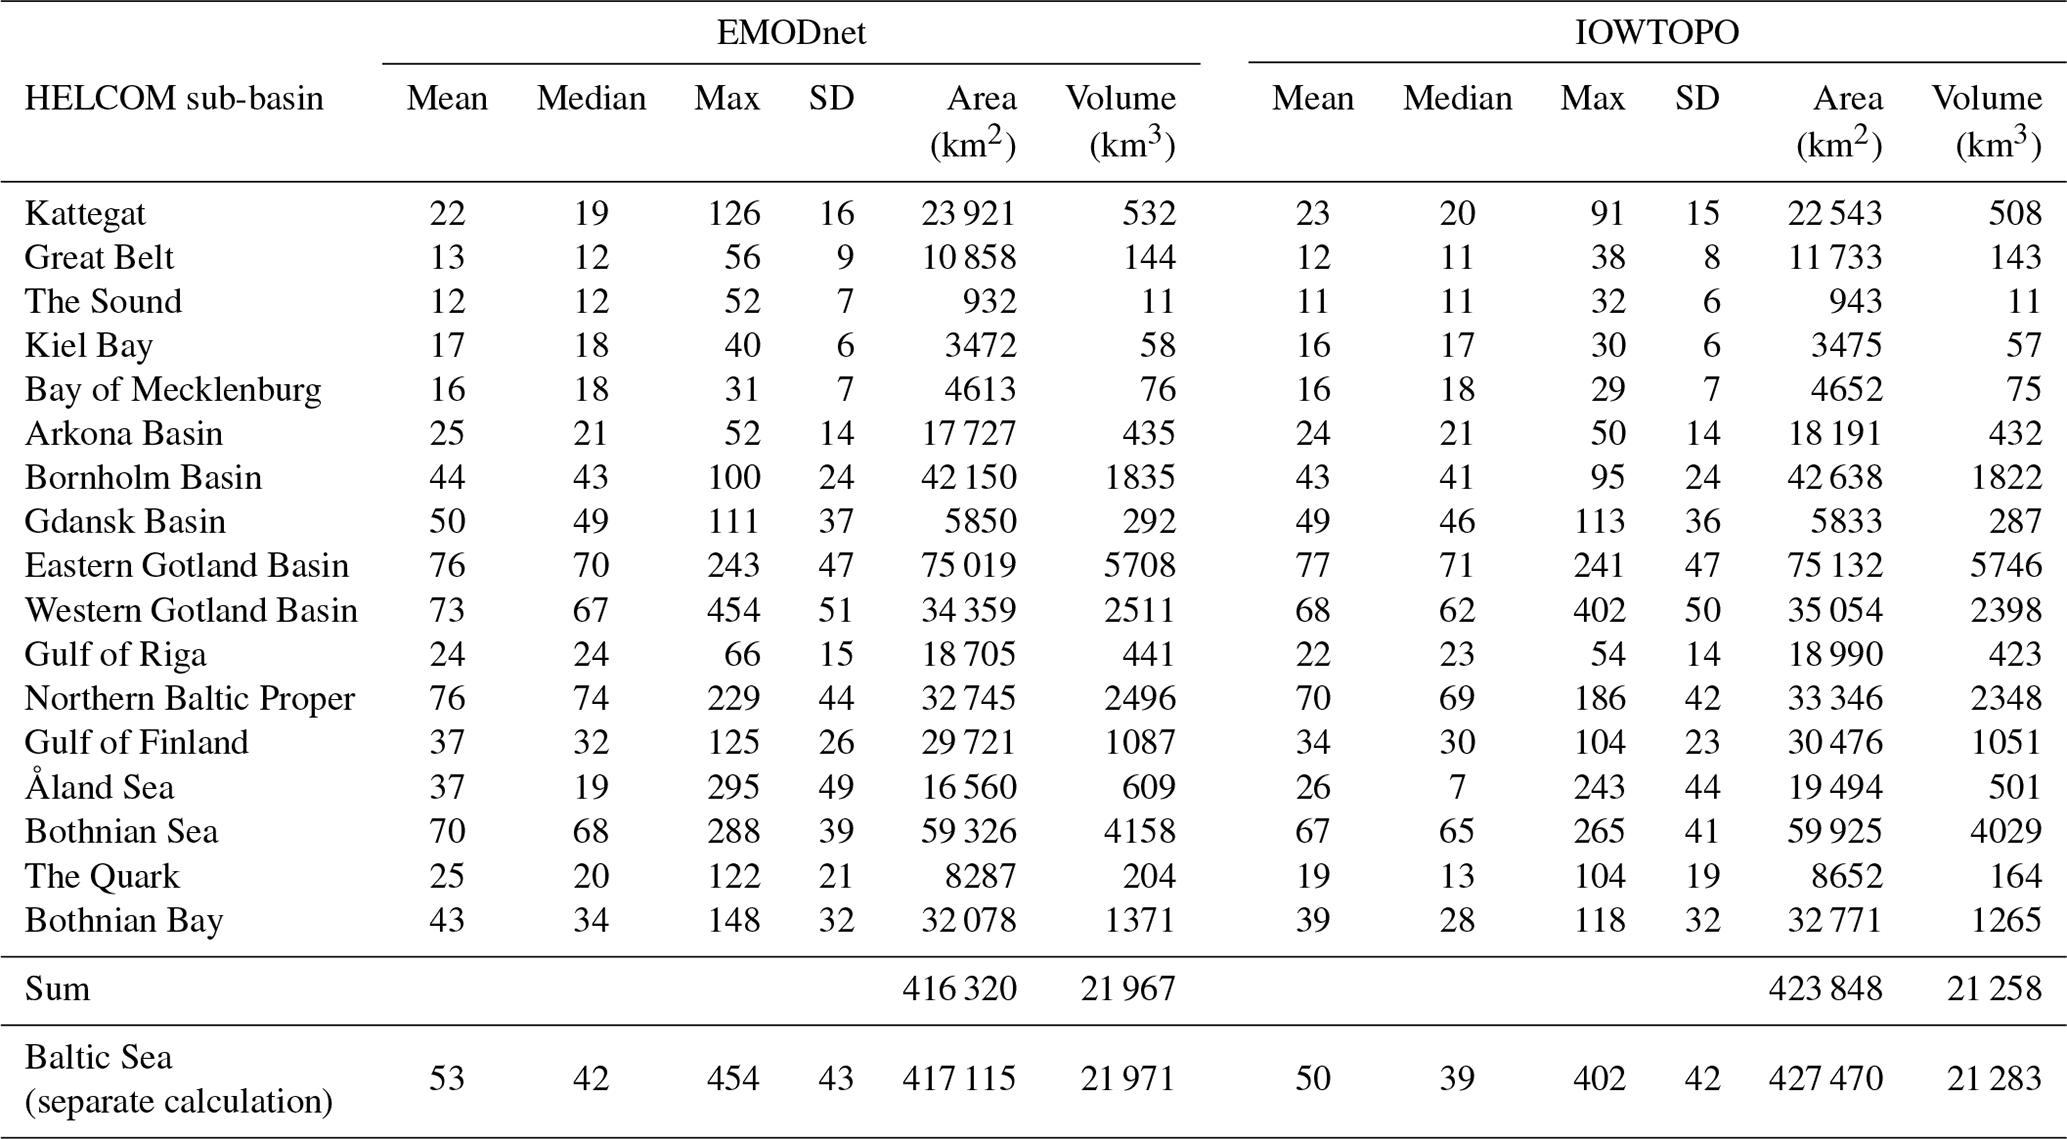 OS - Bathymetric properties of the Baltic Sea